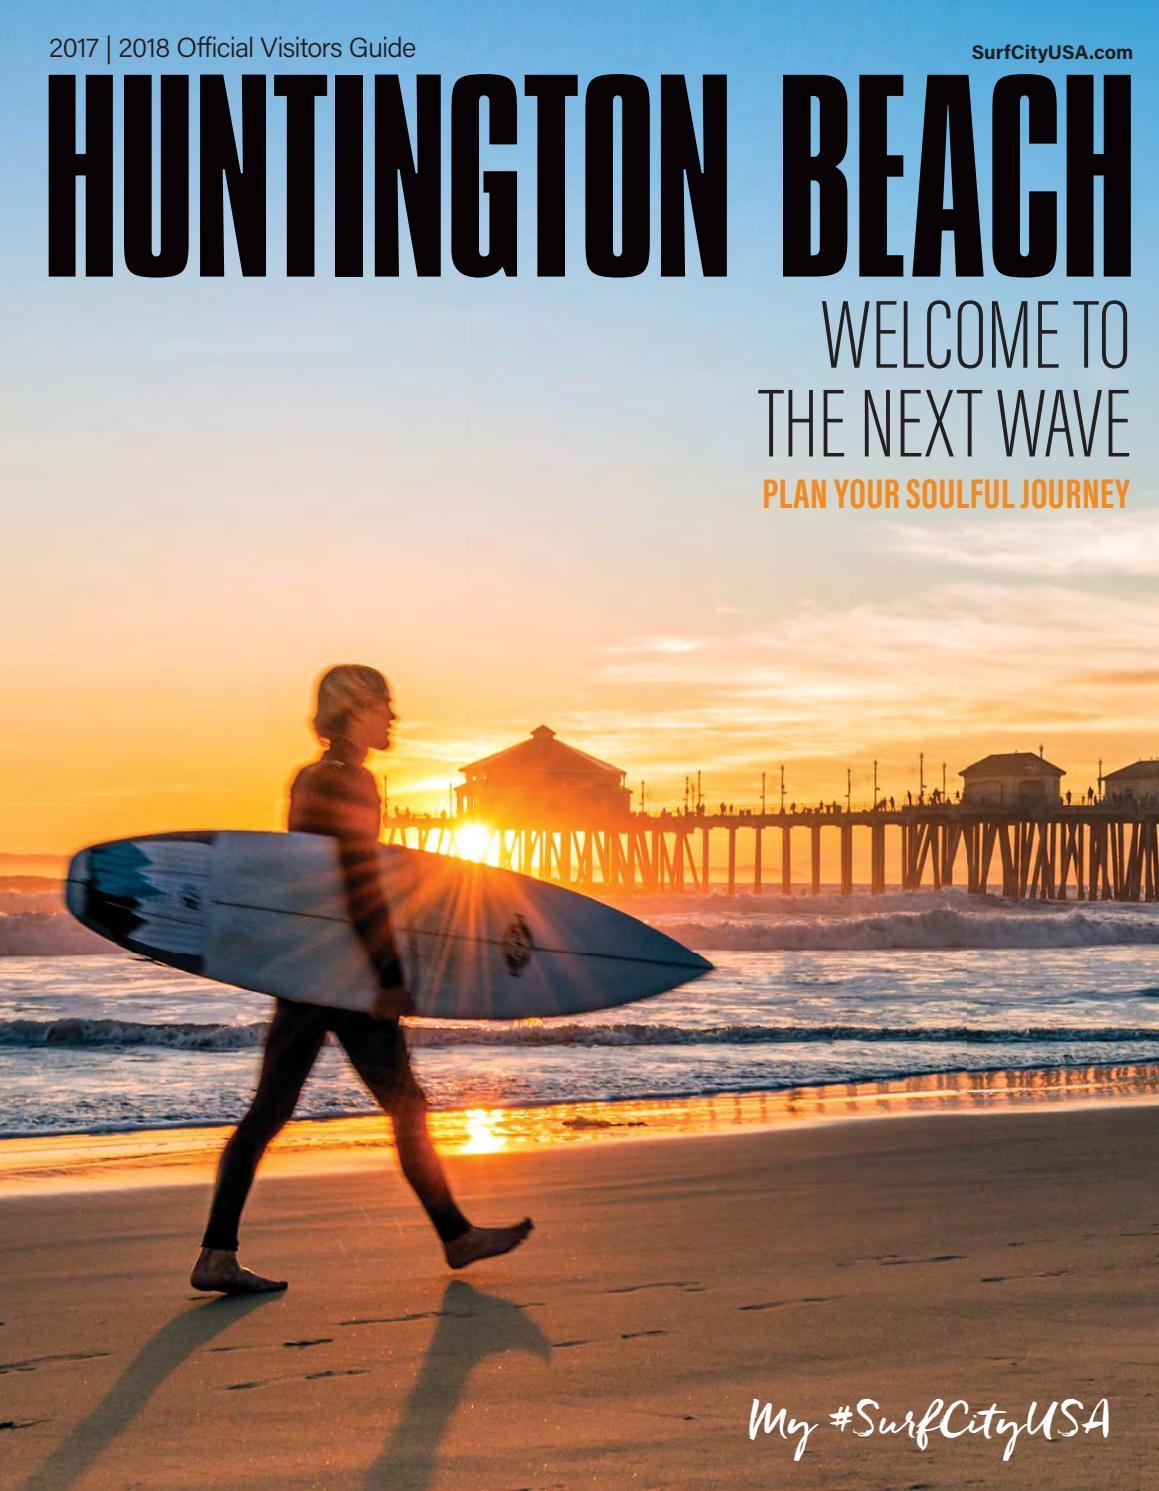 c955167e87a0 HB Visitors Guide 2017 by Orange Coast Magazine - issuu